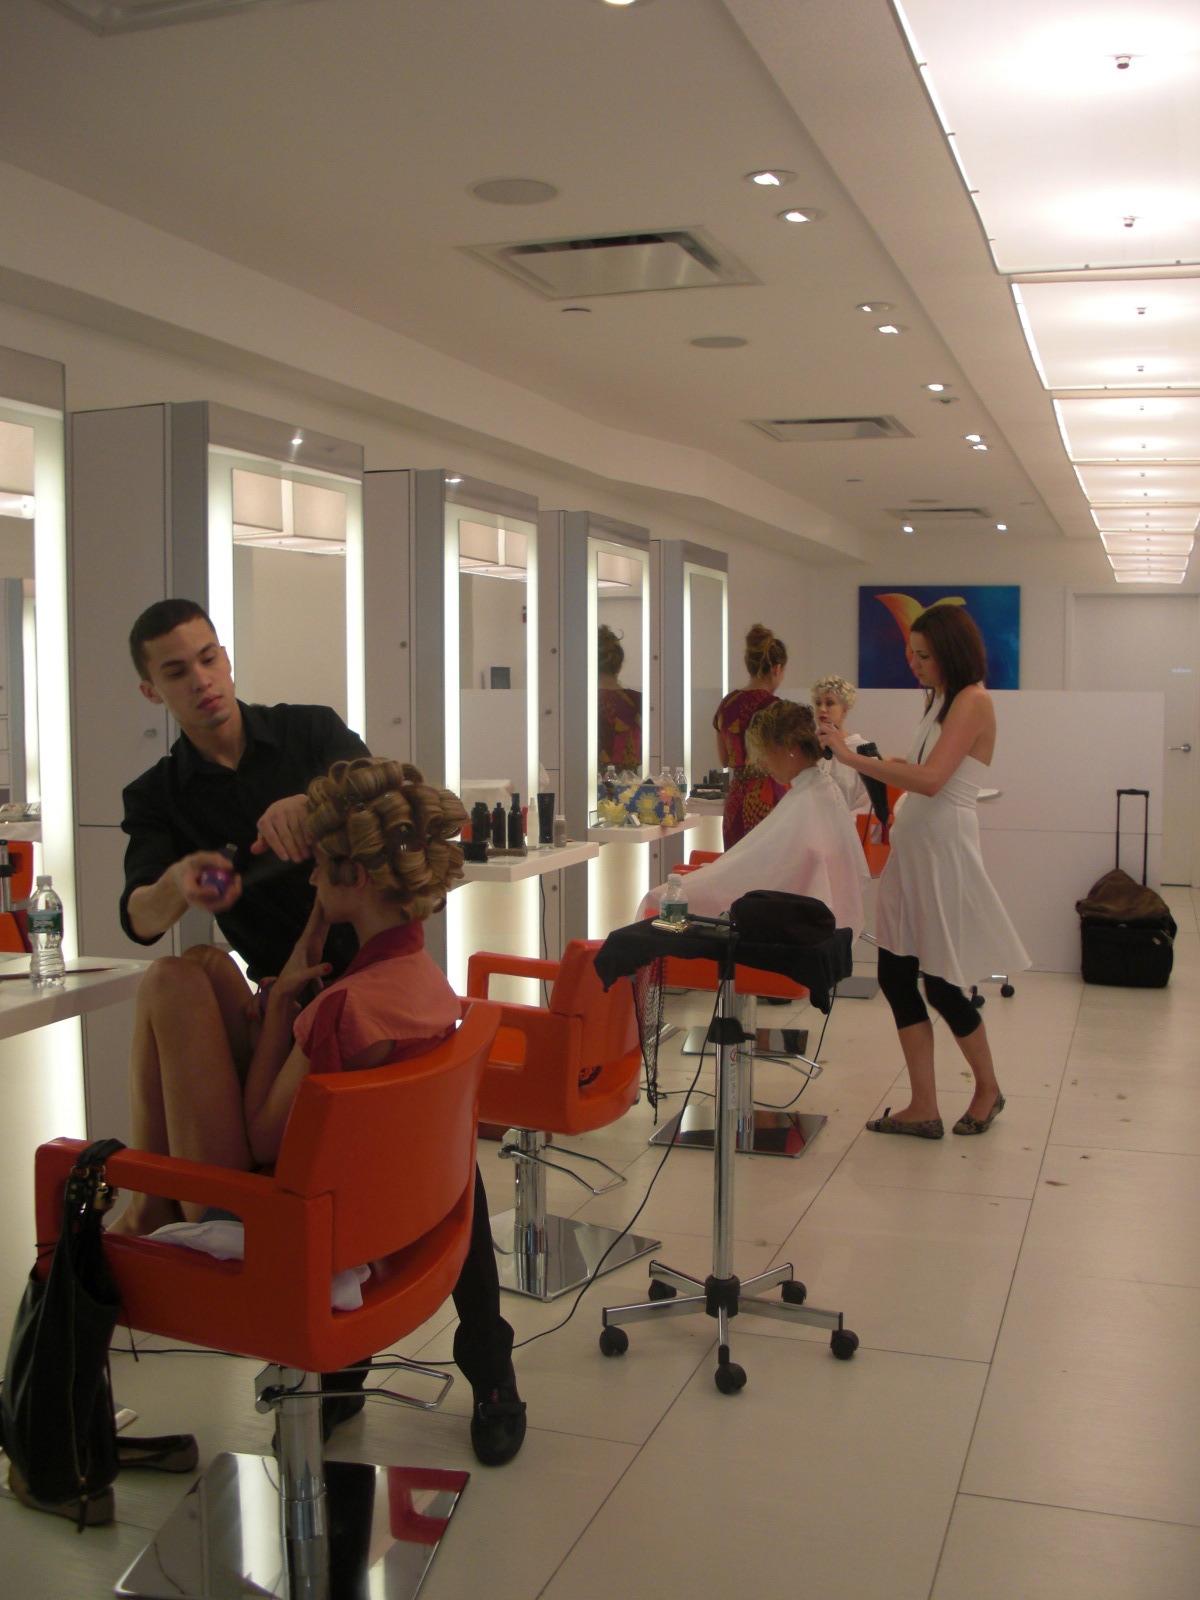 Stylists prep the models at Mizu Salon on Manhattan's tony Park Avenue